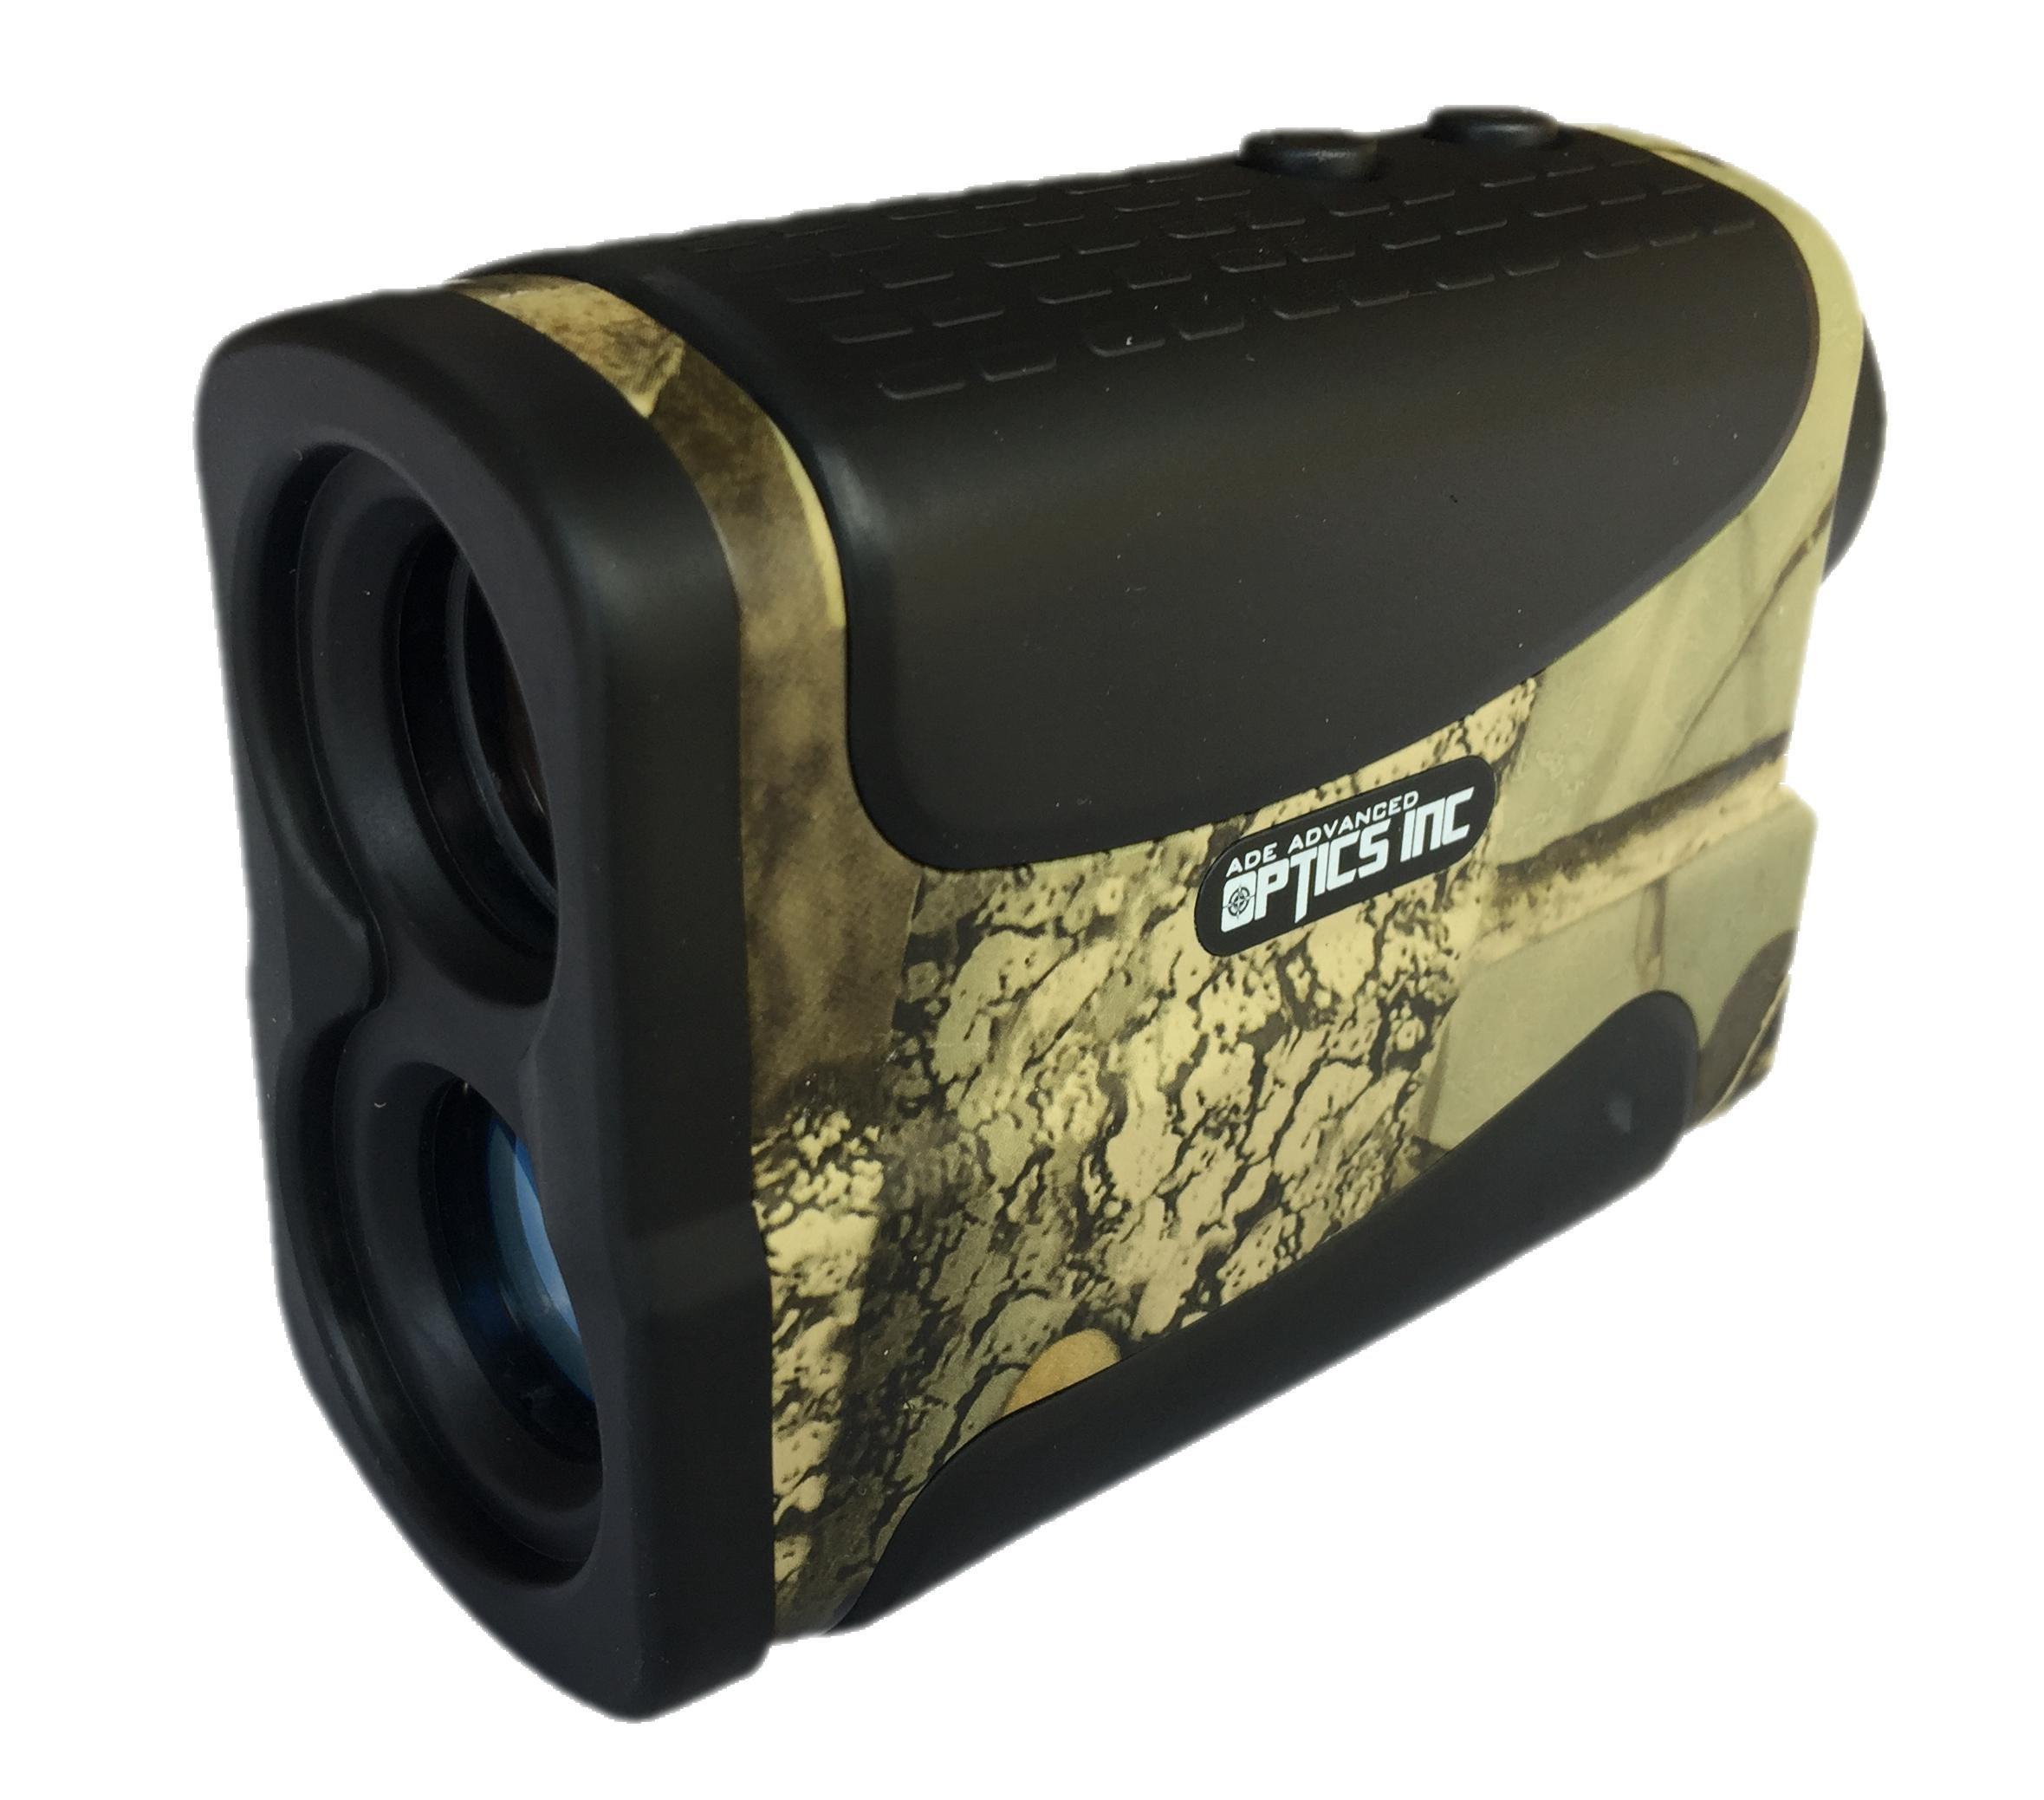 Ade Advanced Optics Golf Rangefinder Hunting Range Finder with PinSeeker Laser Binoculars, Camouflage by Ade Advanced Optics (Image #4)